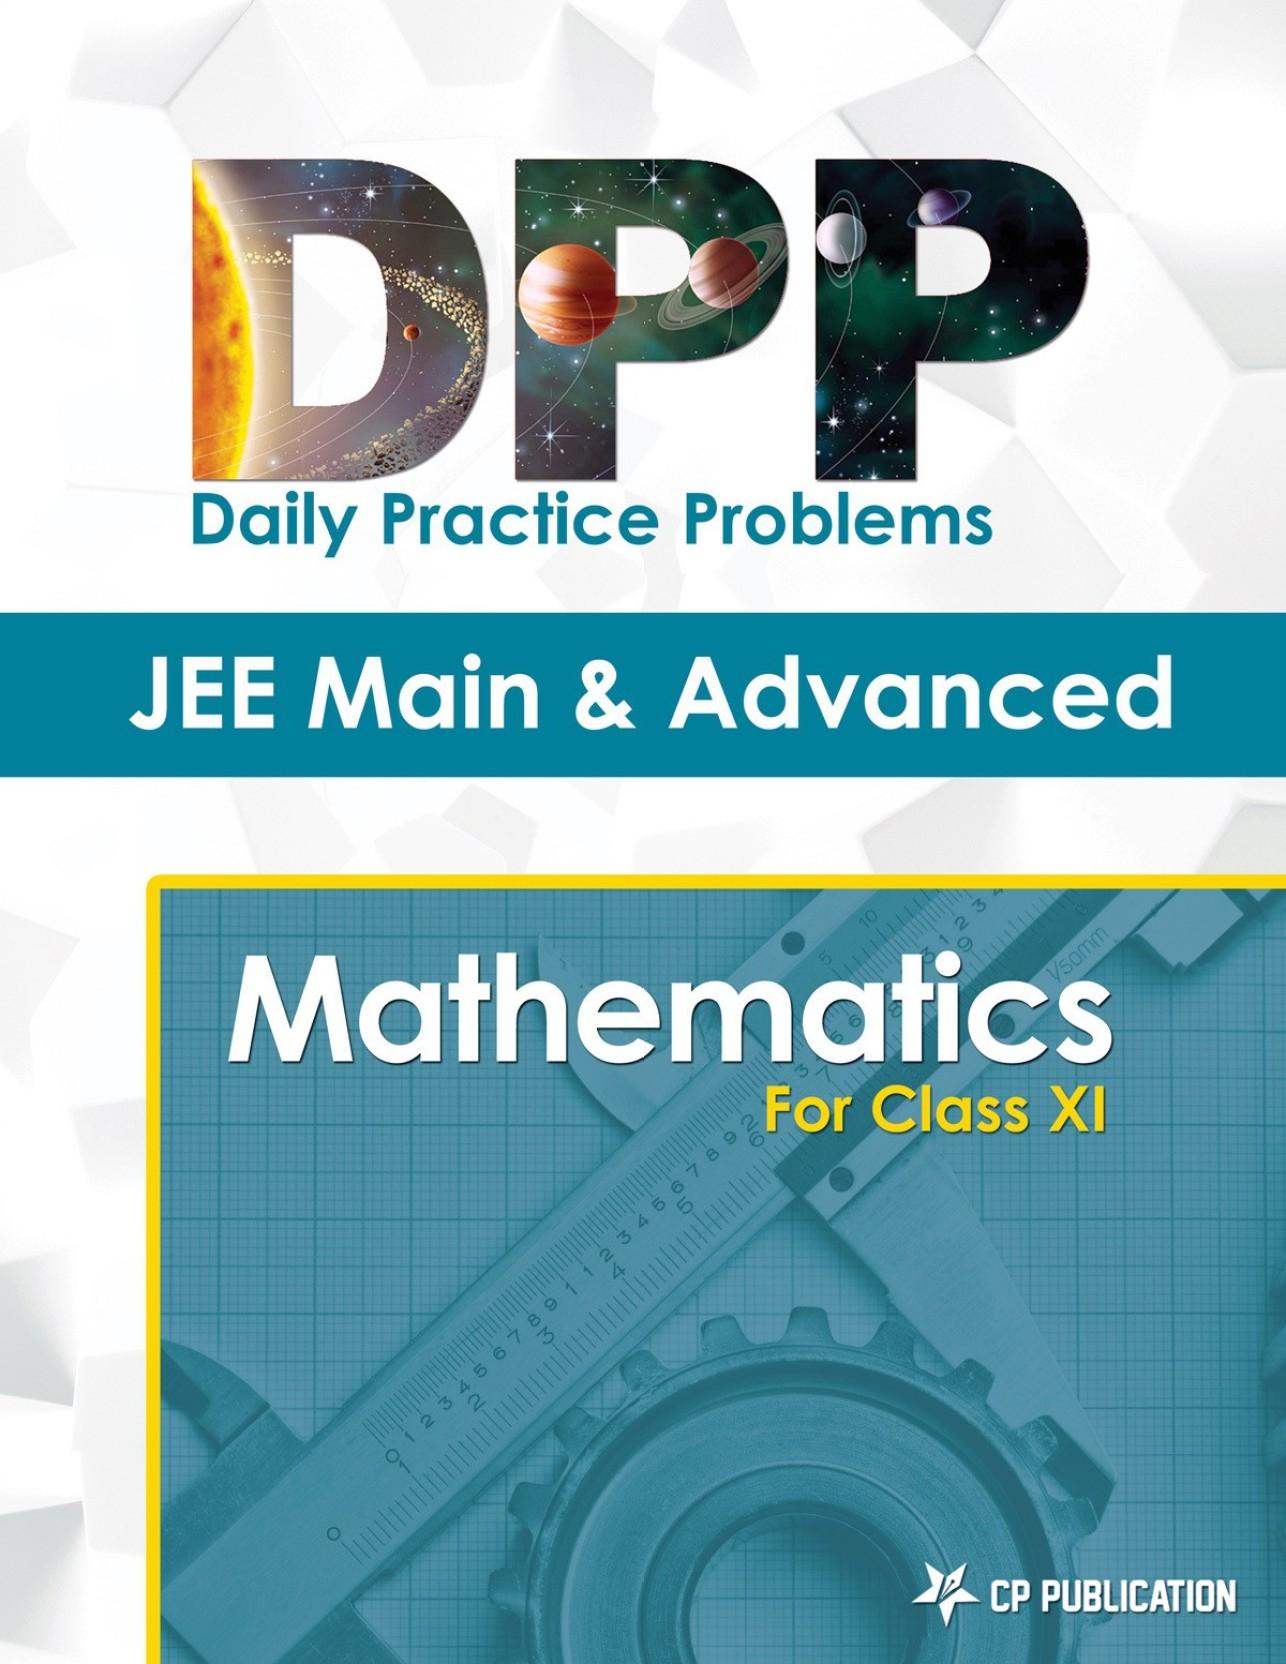 JEE Advanced Maths